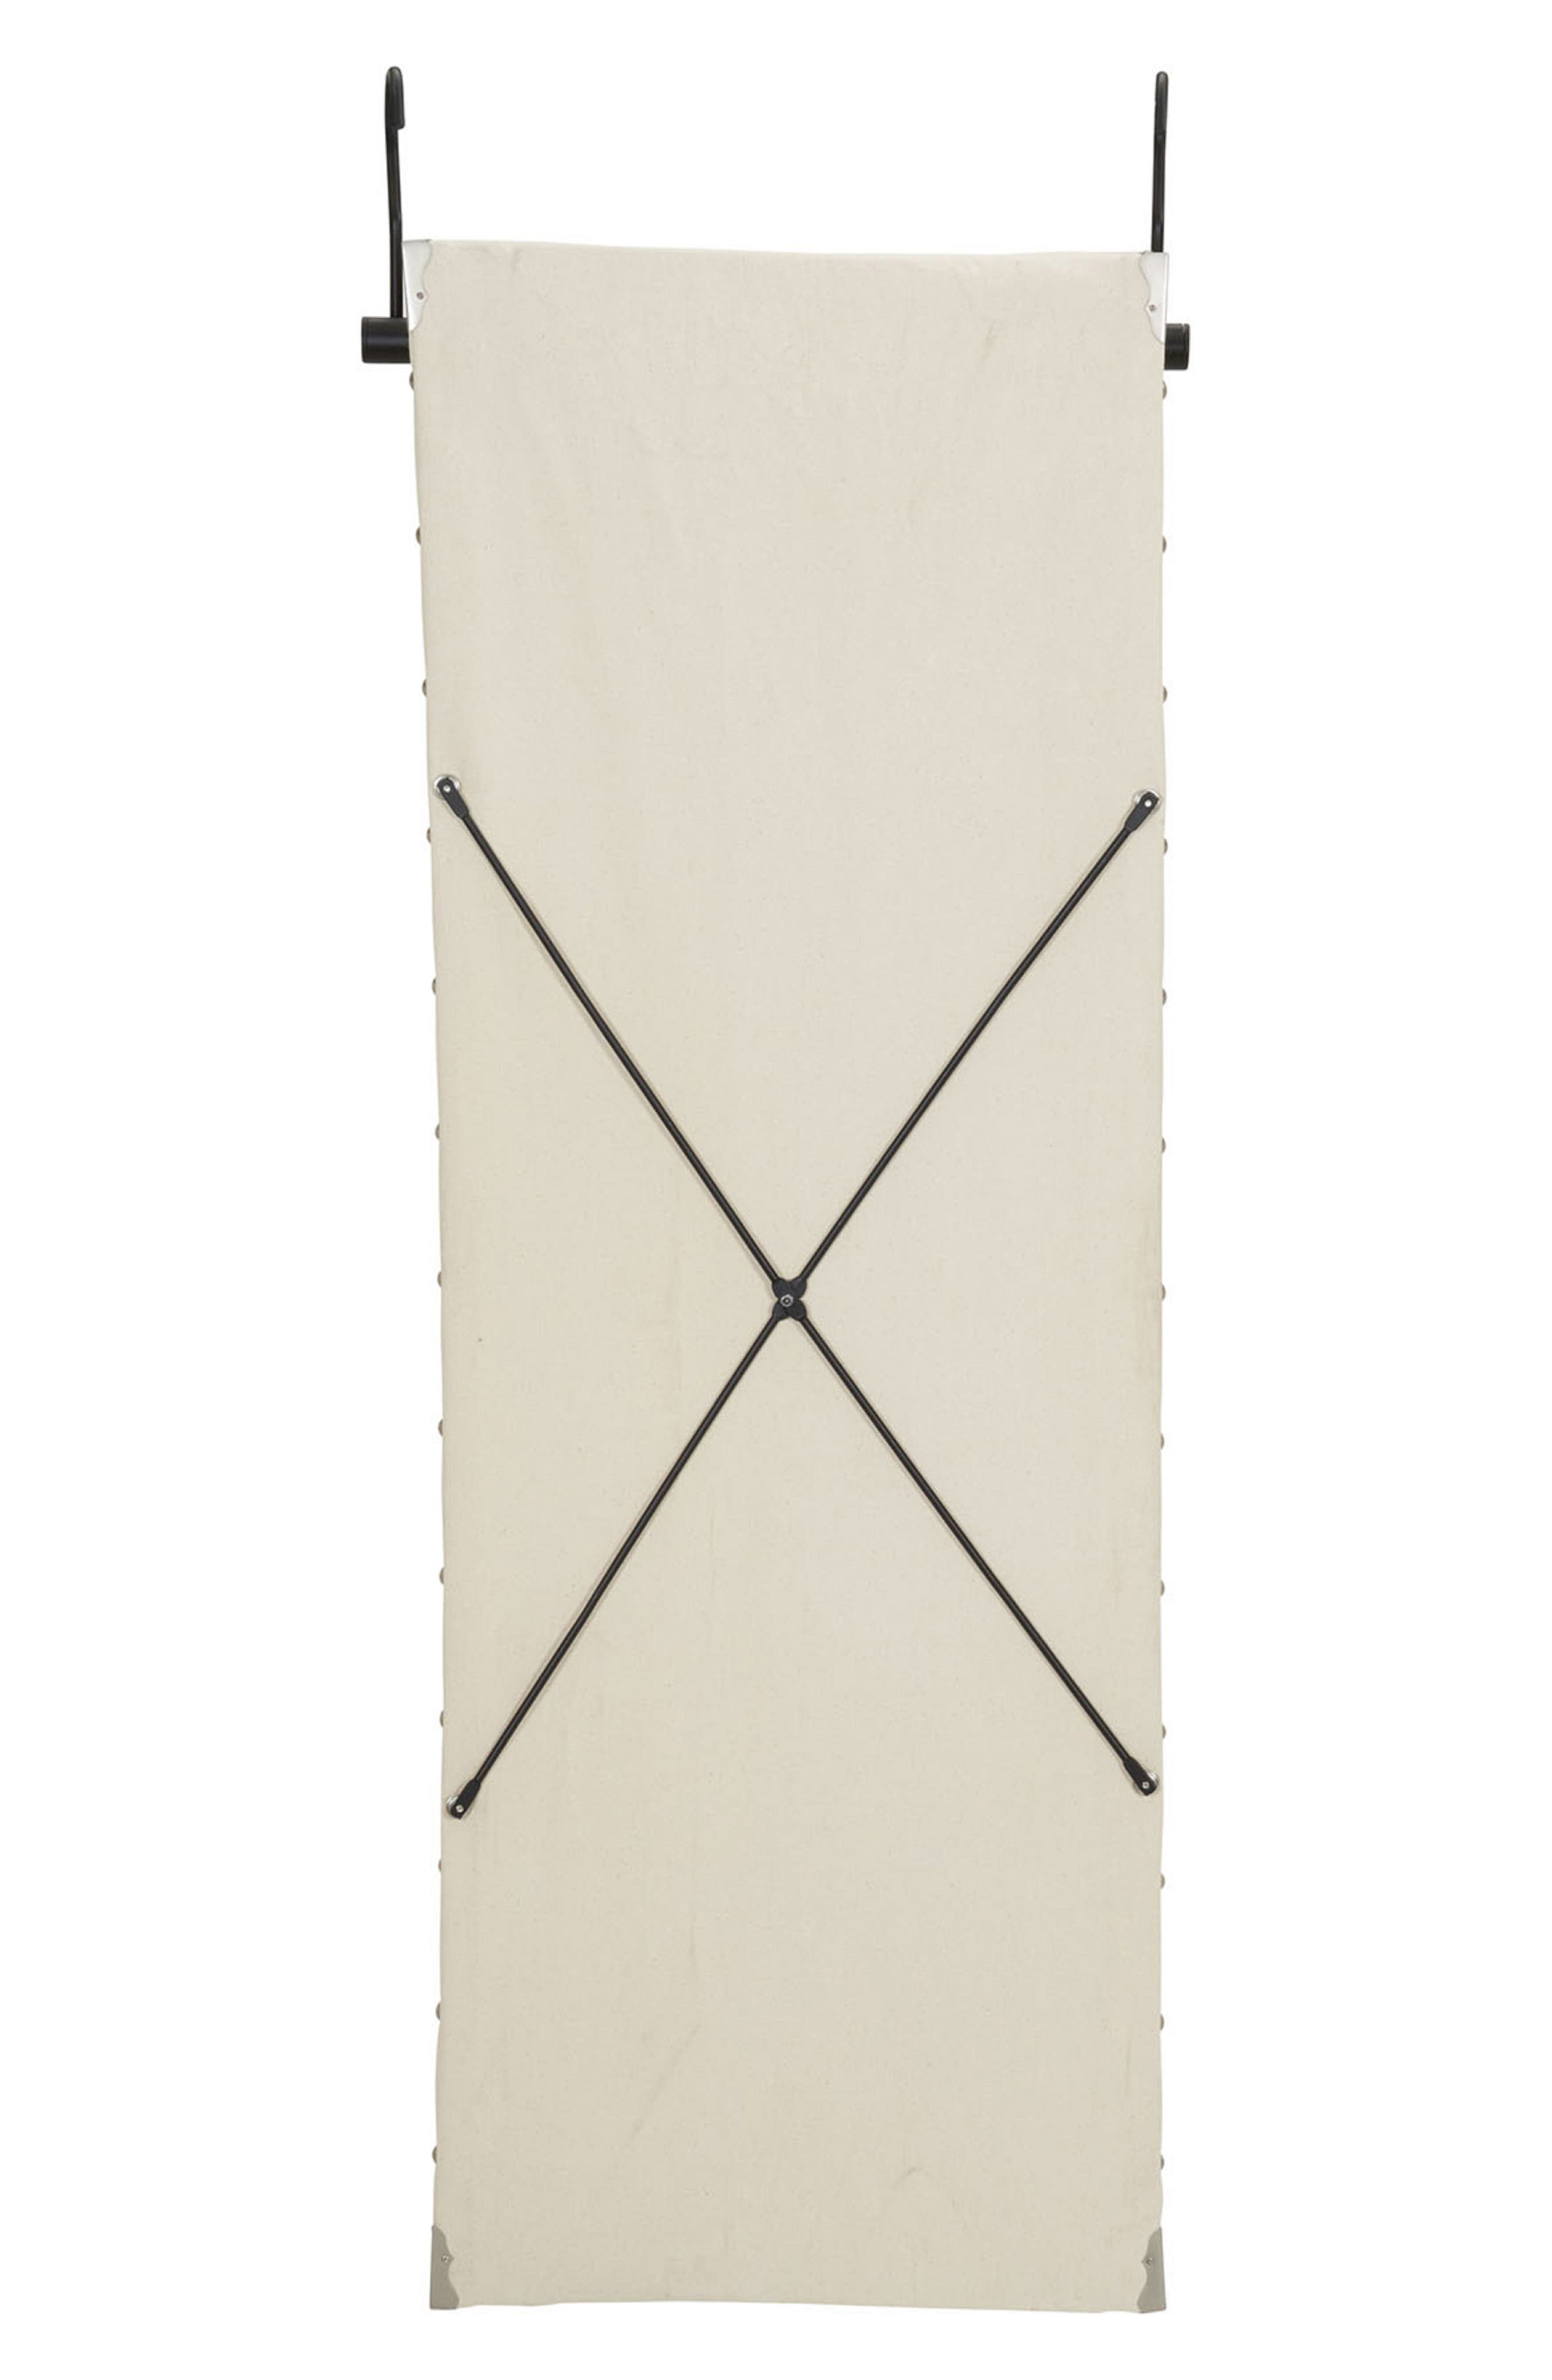 CedarStow Clothing Wardrobe,                             Alternate thumbnail 2, color,                             BEIGE AND CEDAR